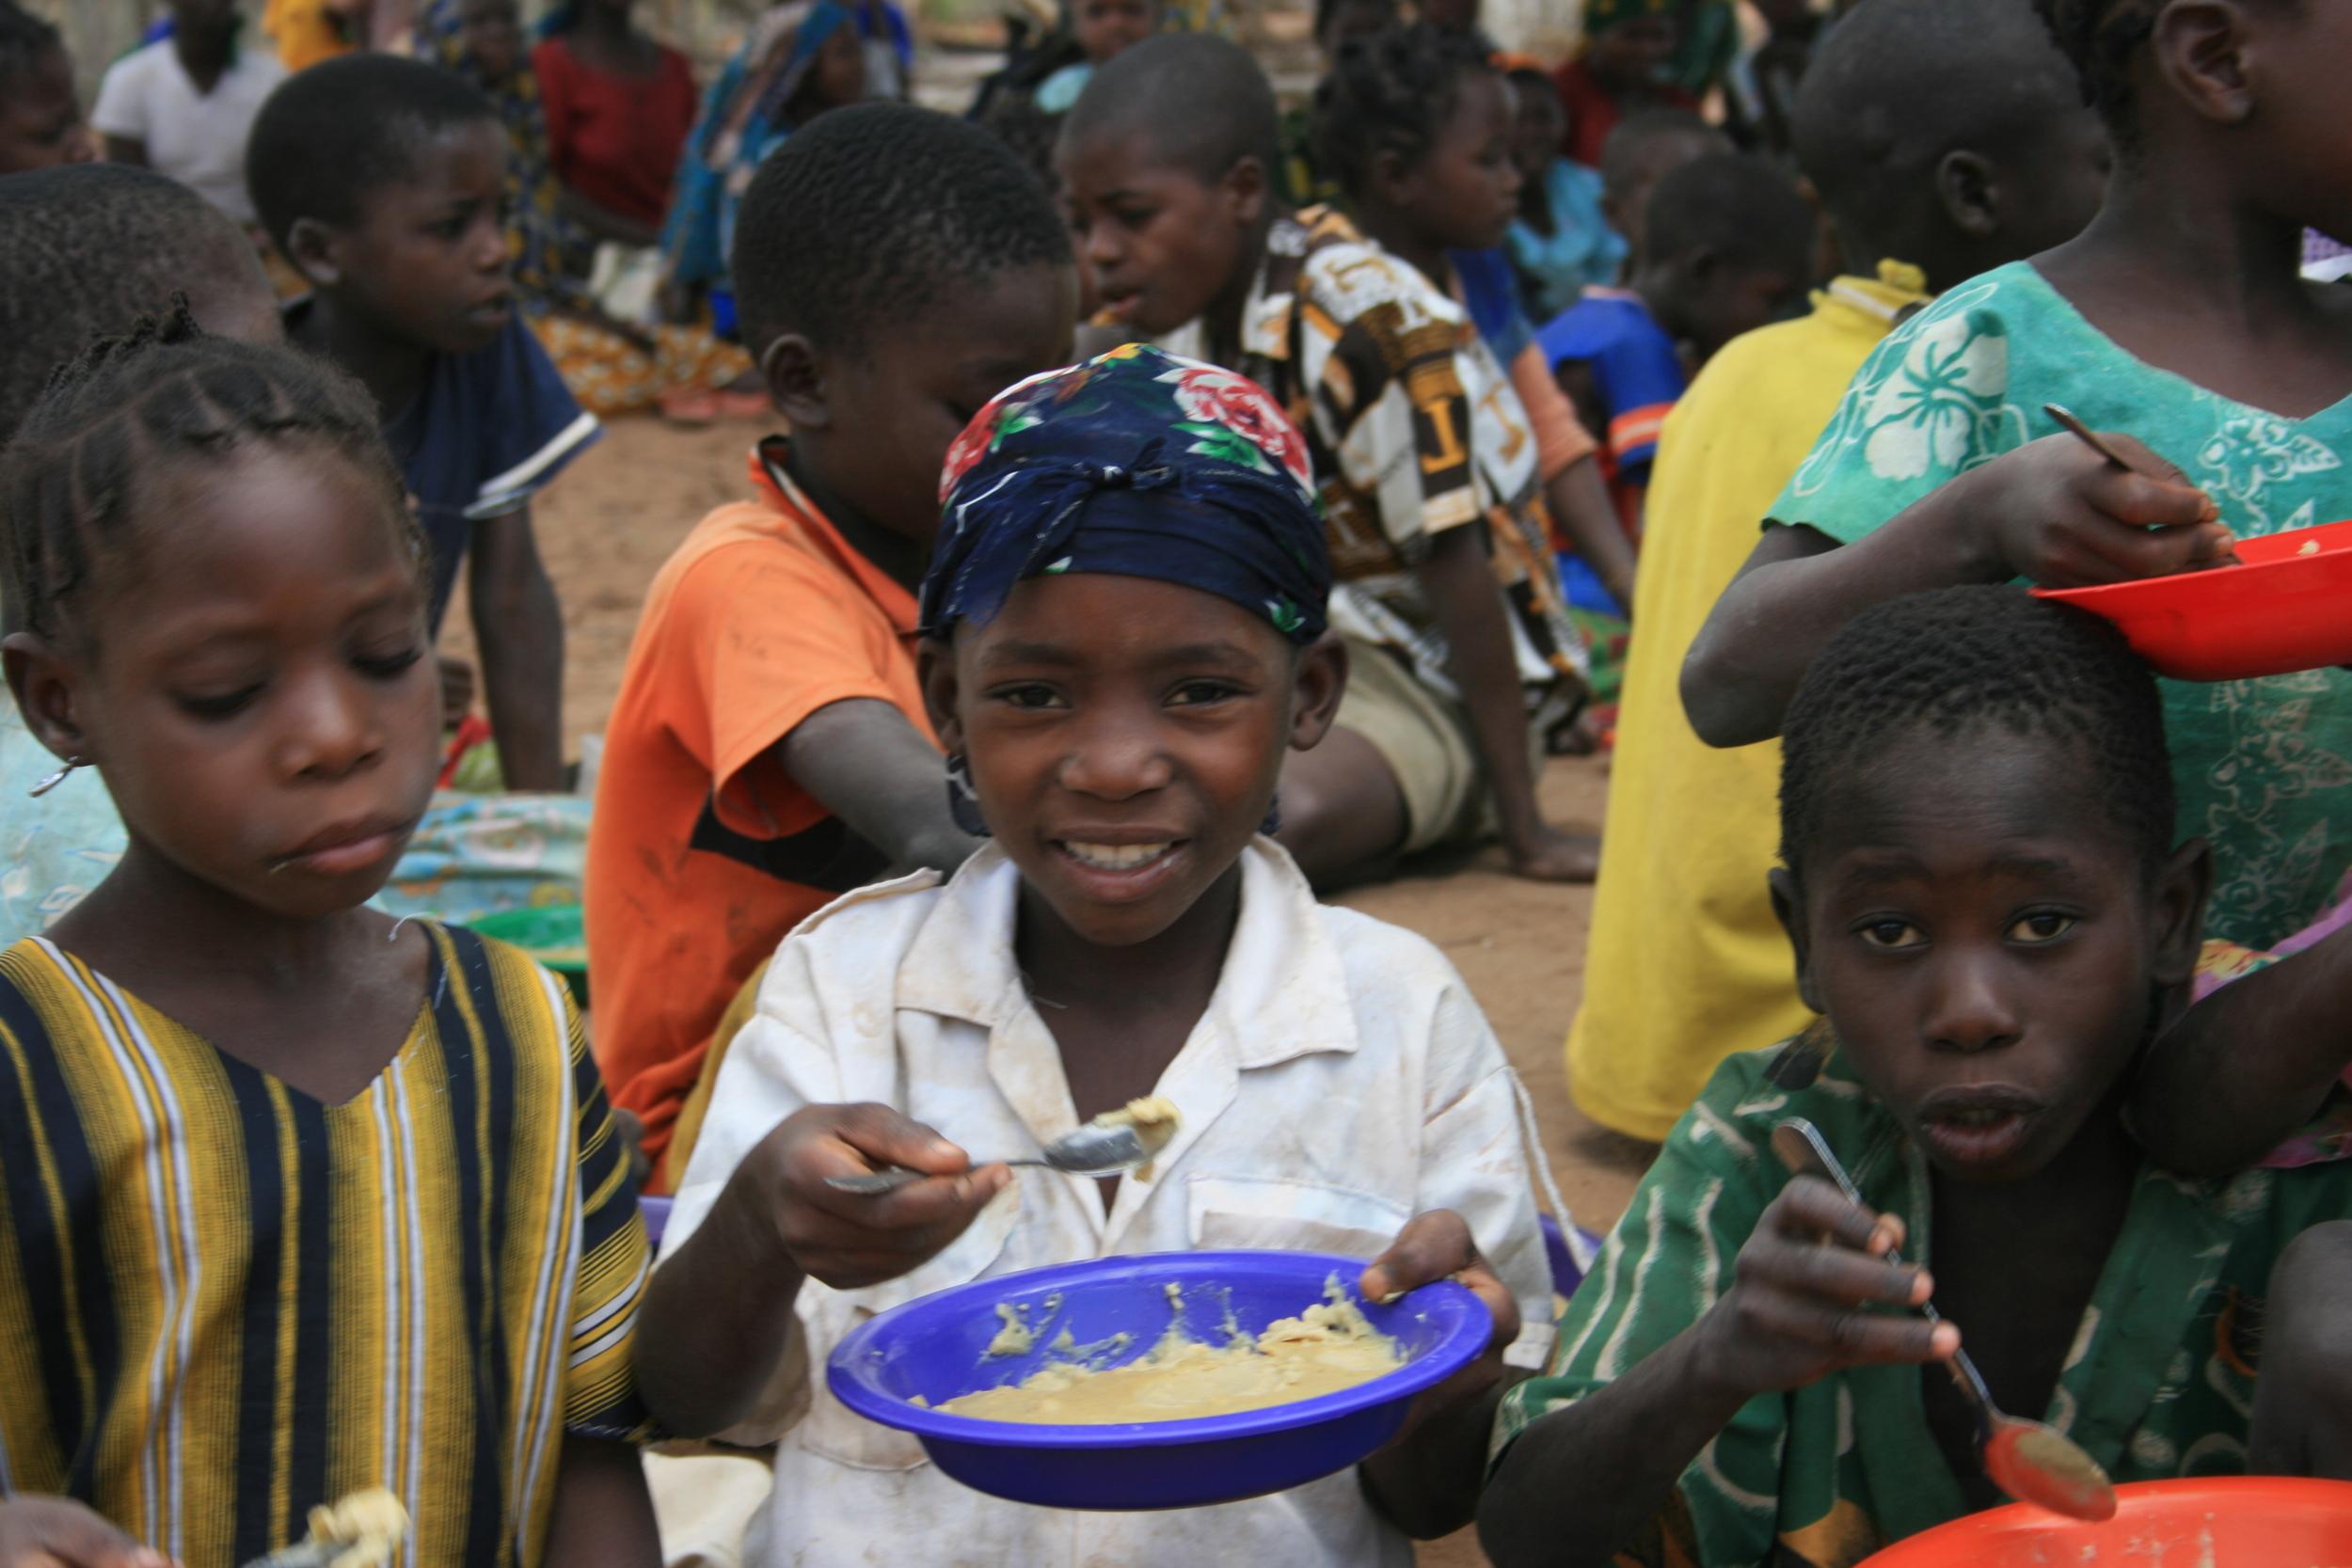 Ningaia school feeding project 3.JPG